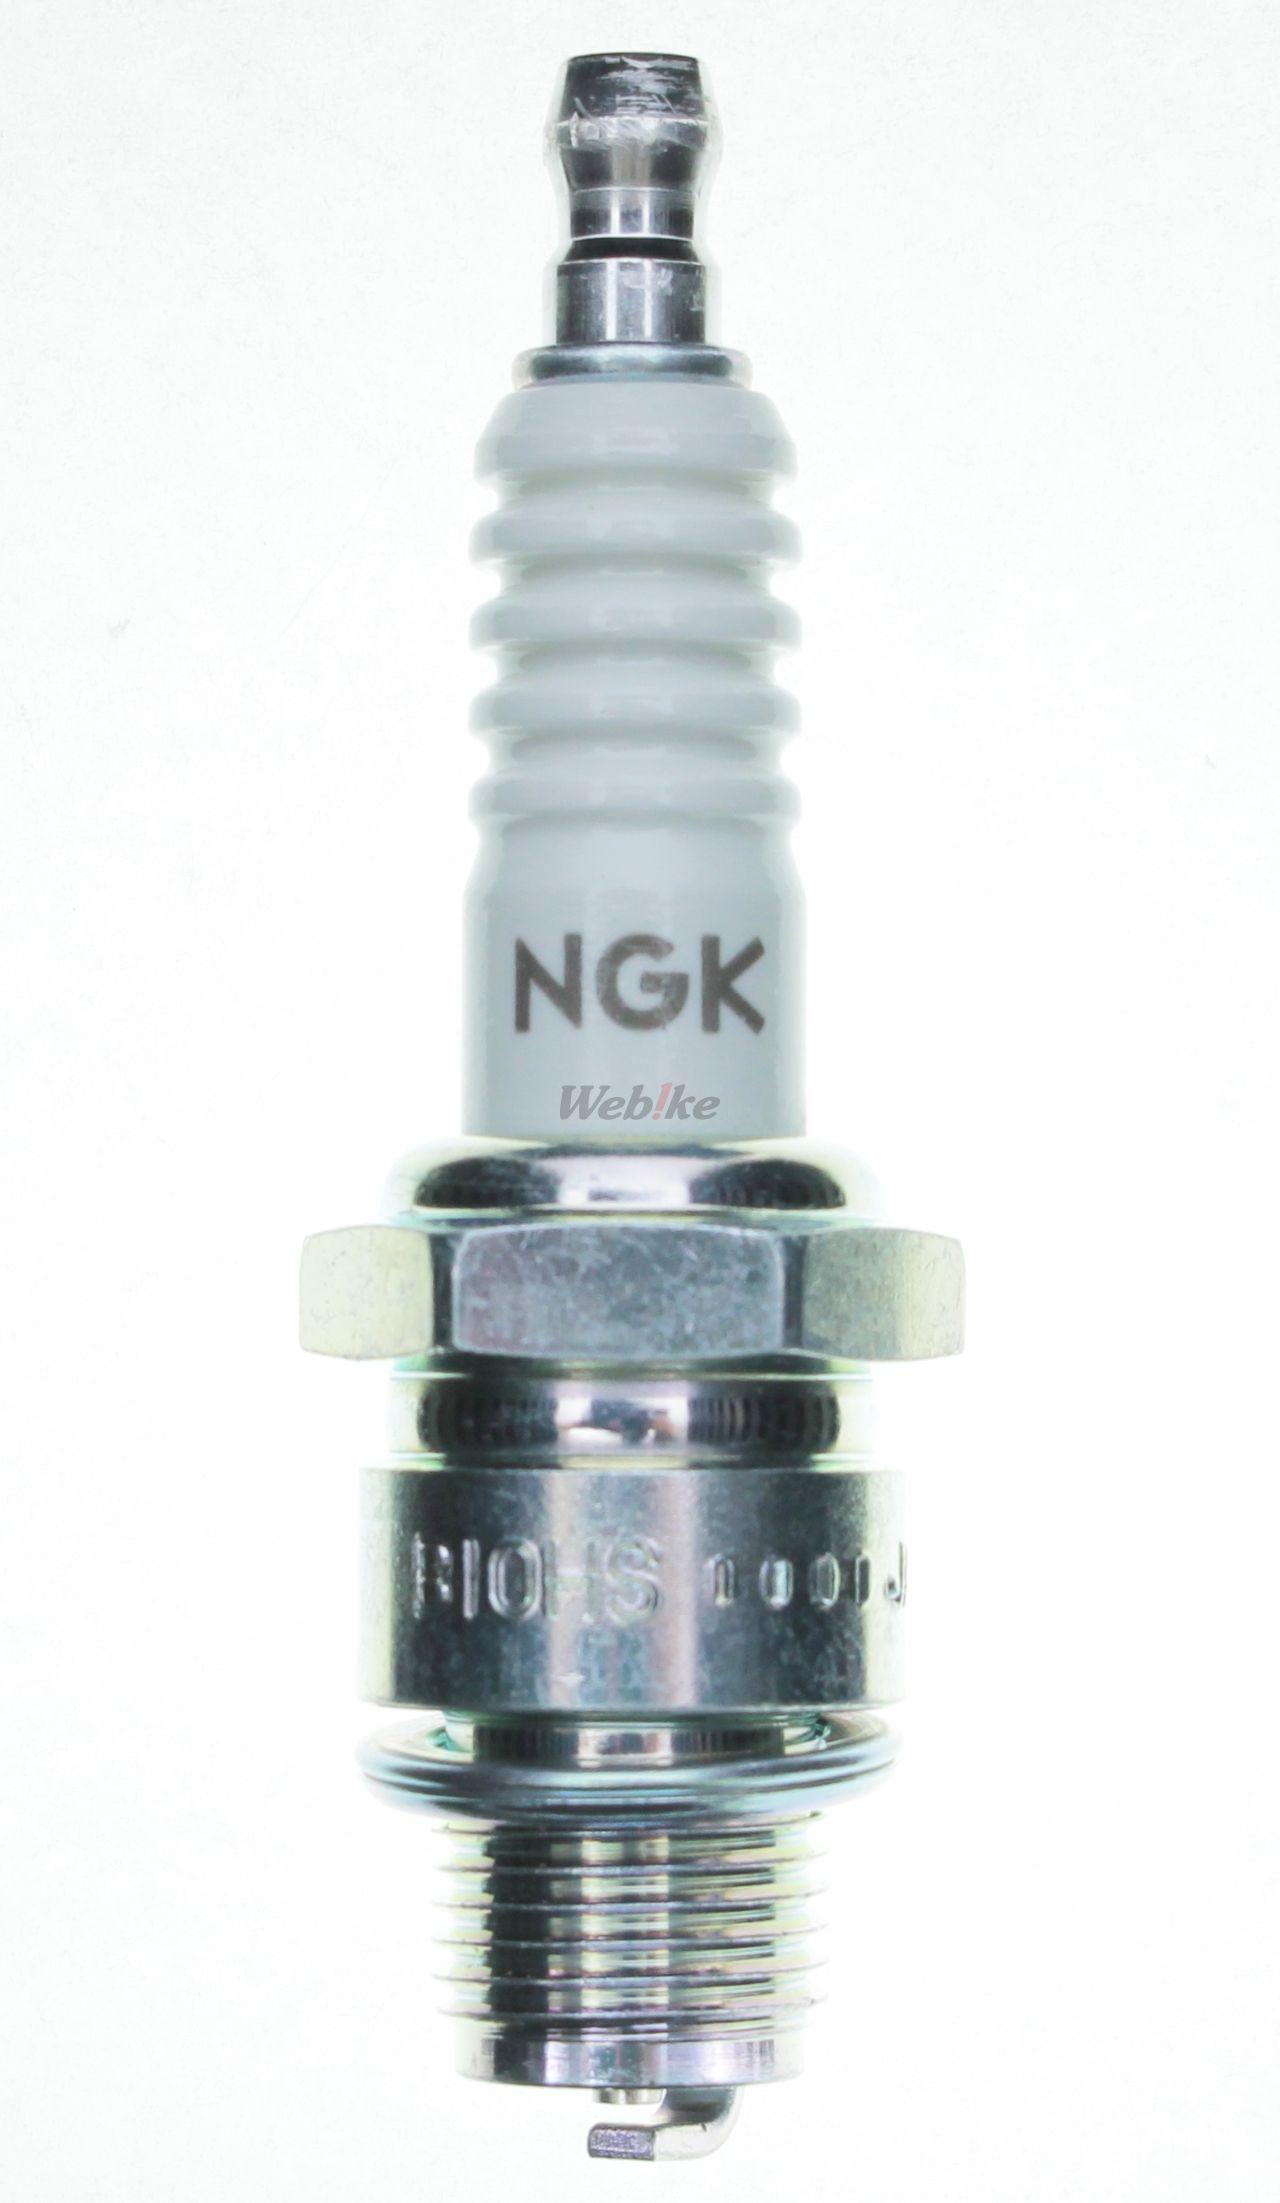 【NGK】標準型 火星塞 B10HS 2399 - 「Webike-摩托百貨」